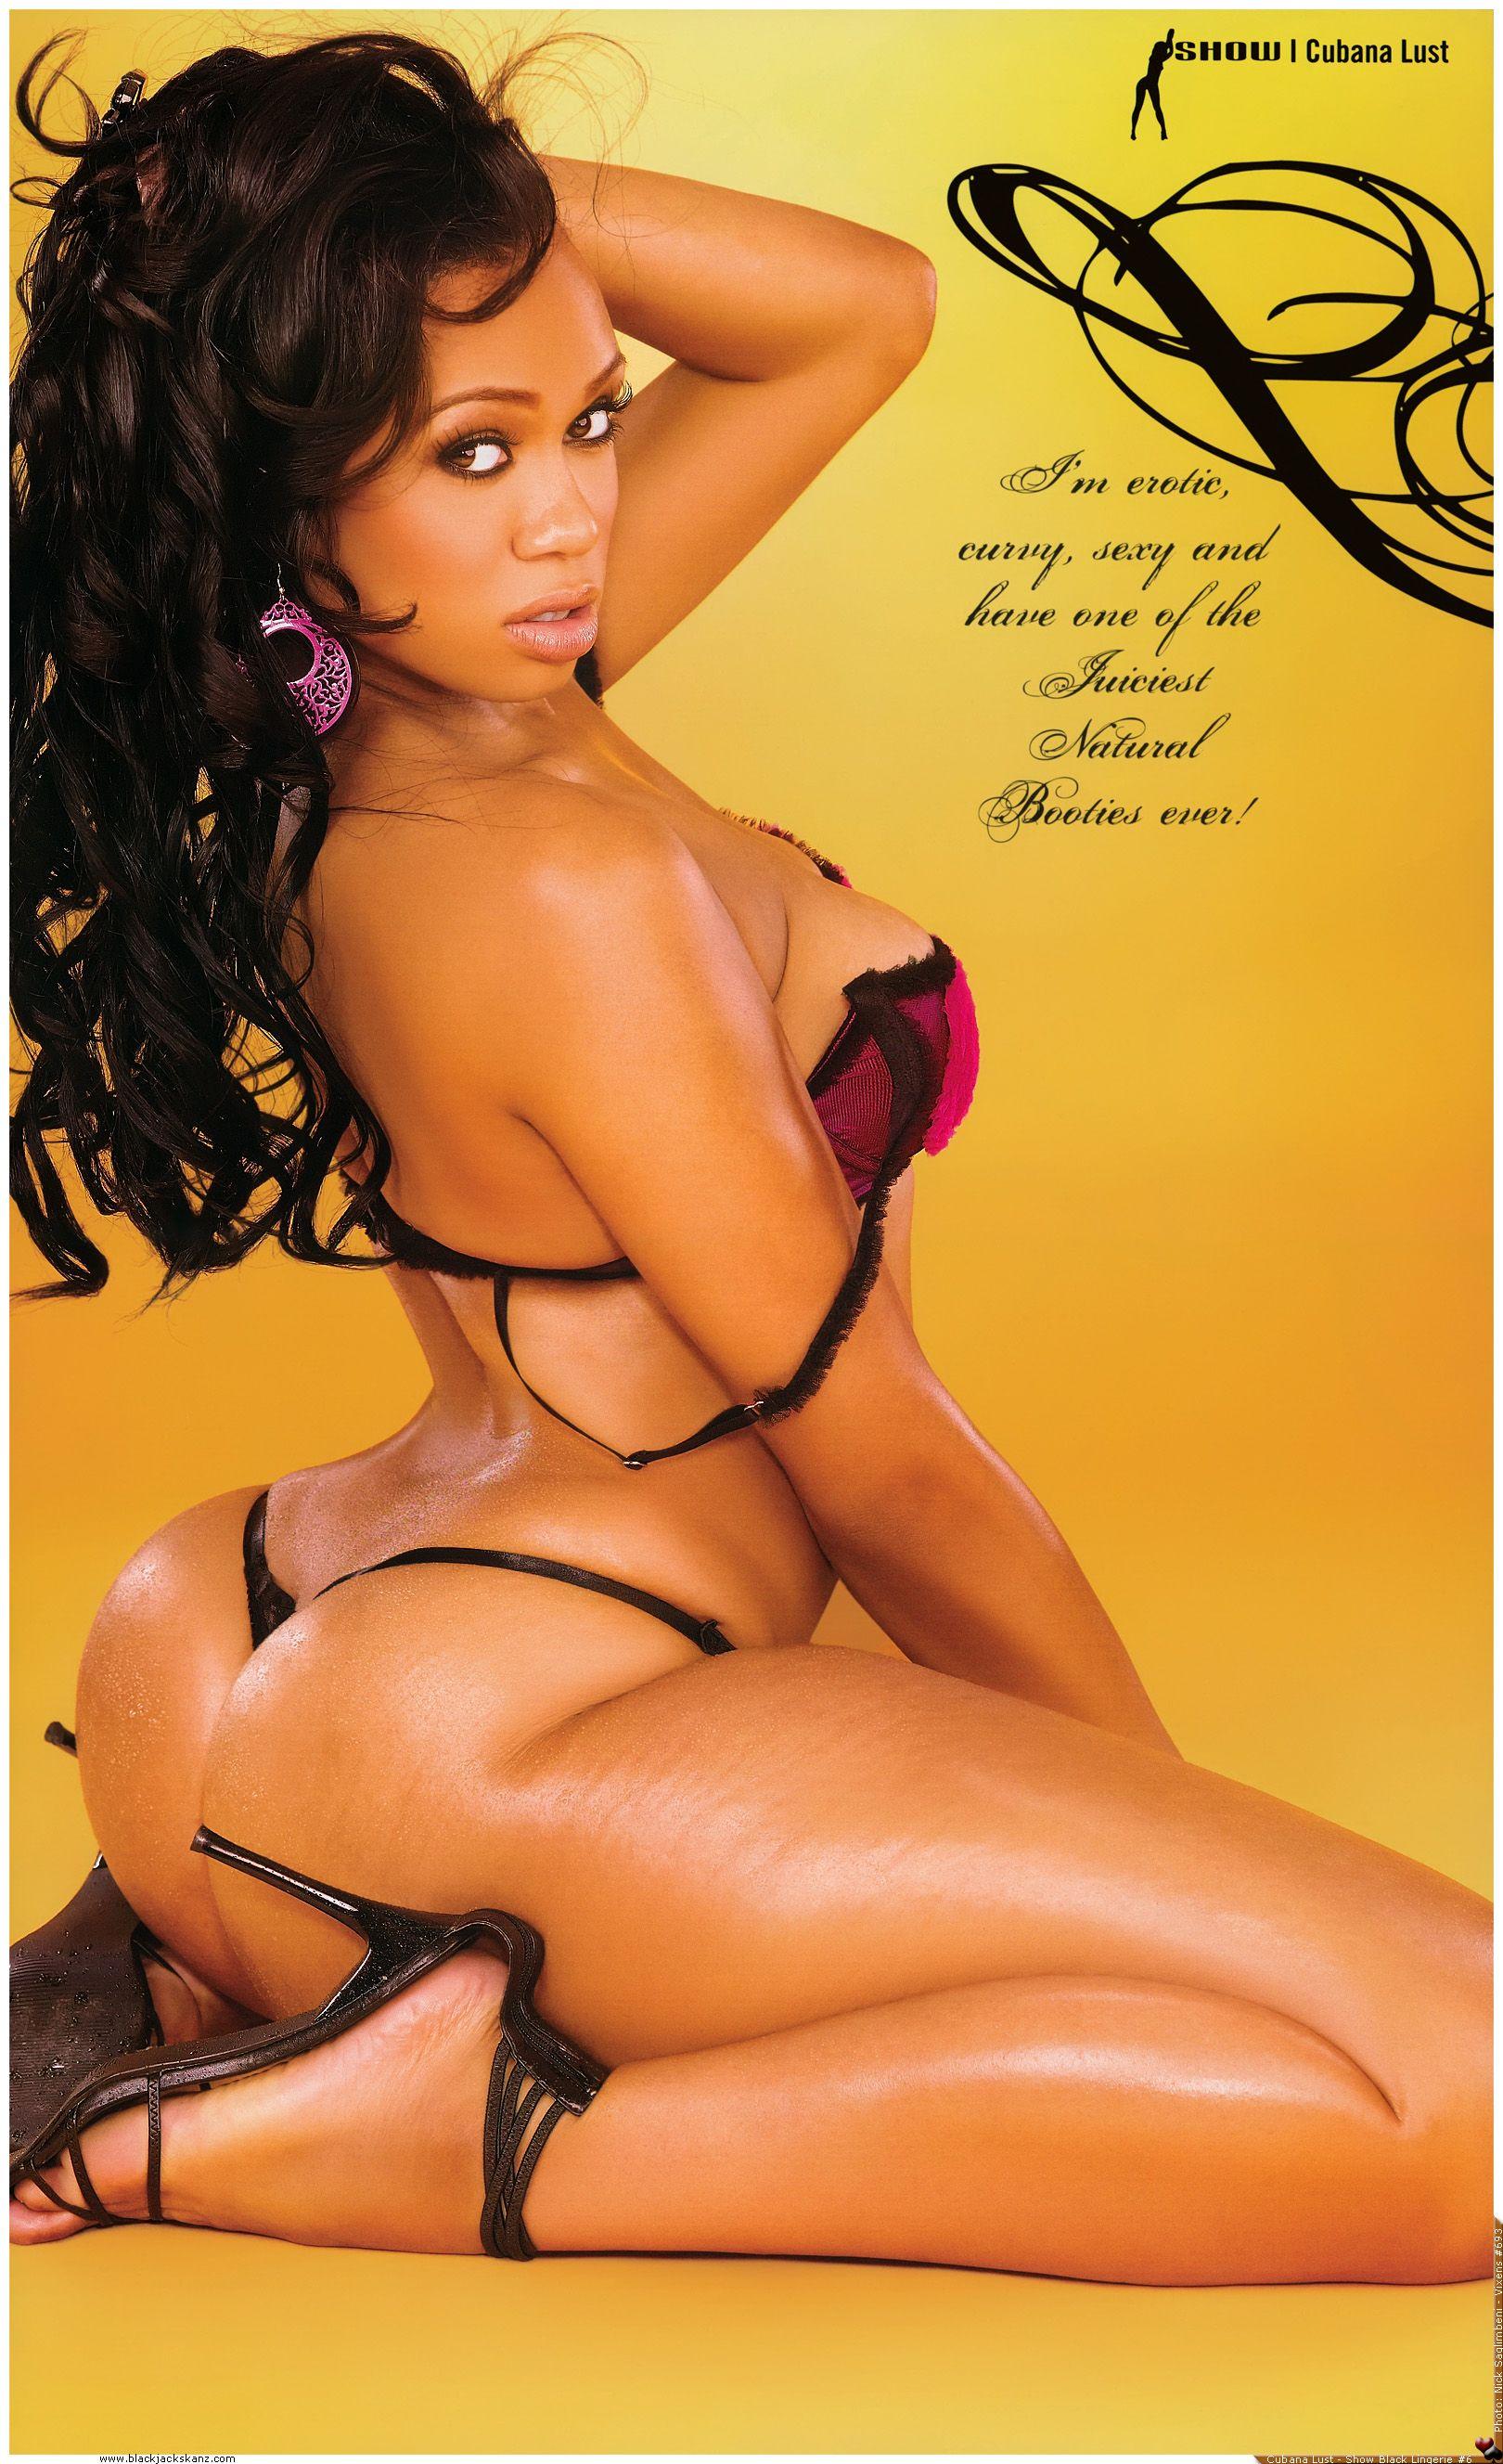 gem web lust Cubana show